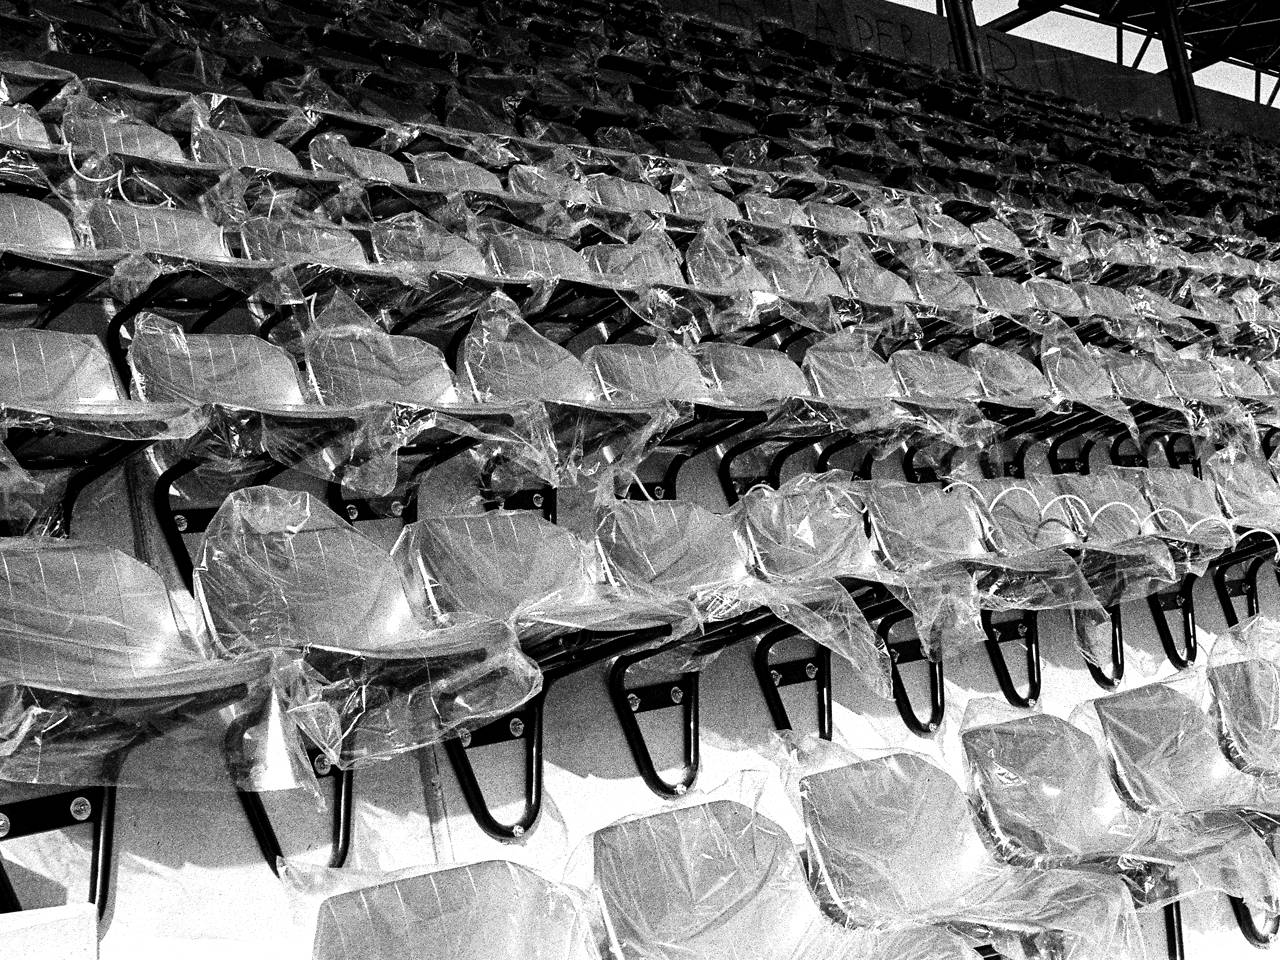 stadio mirabello sedili